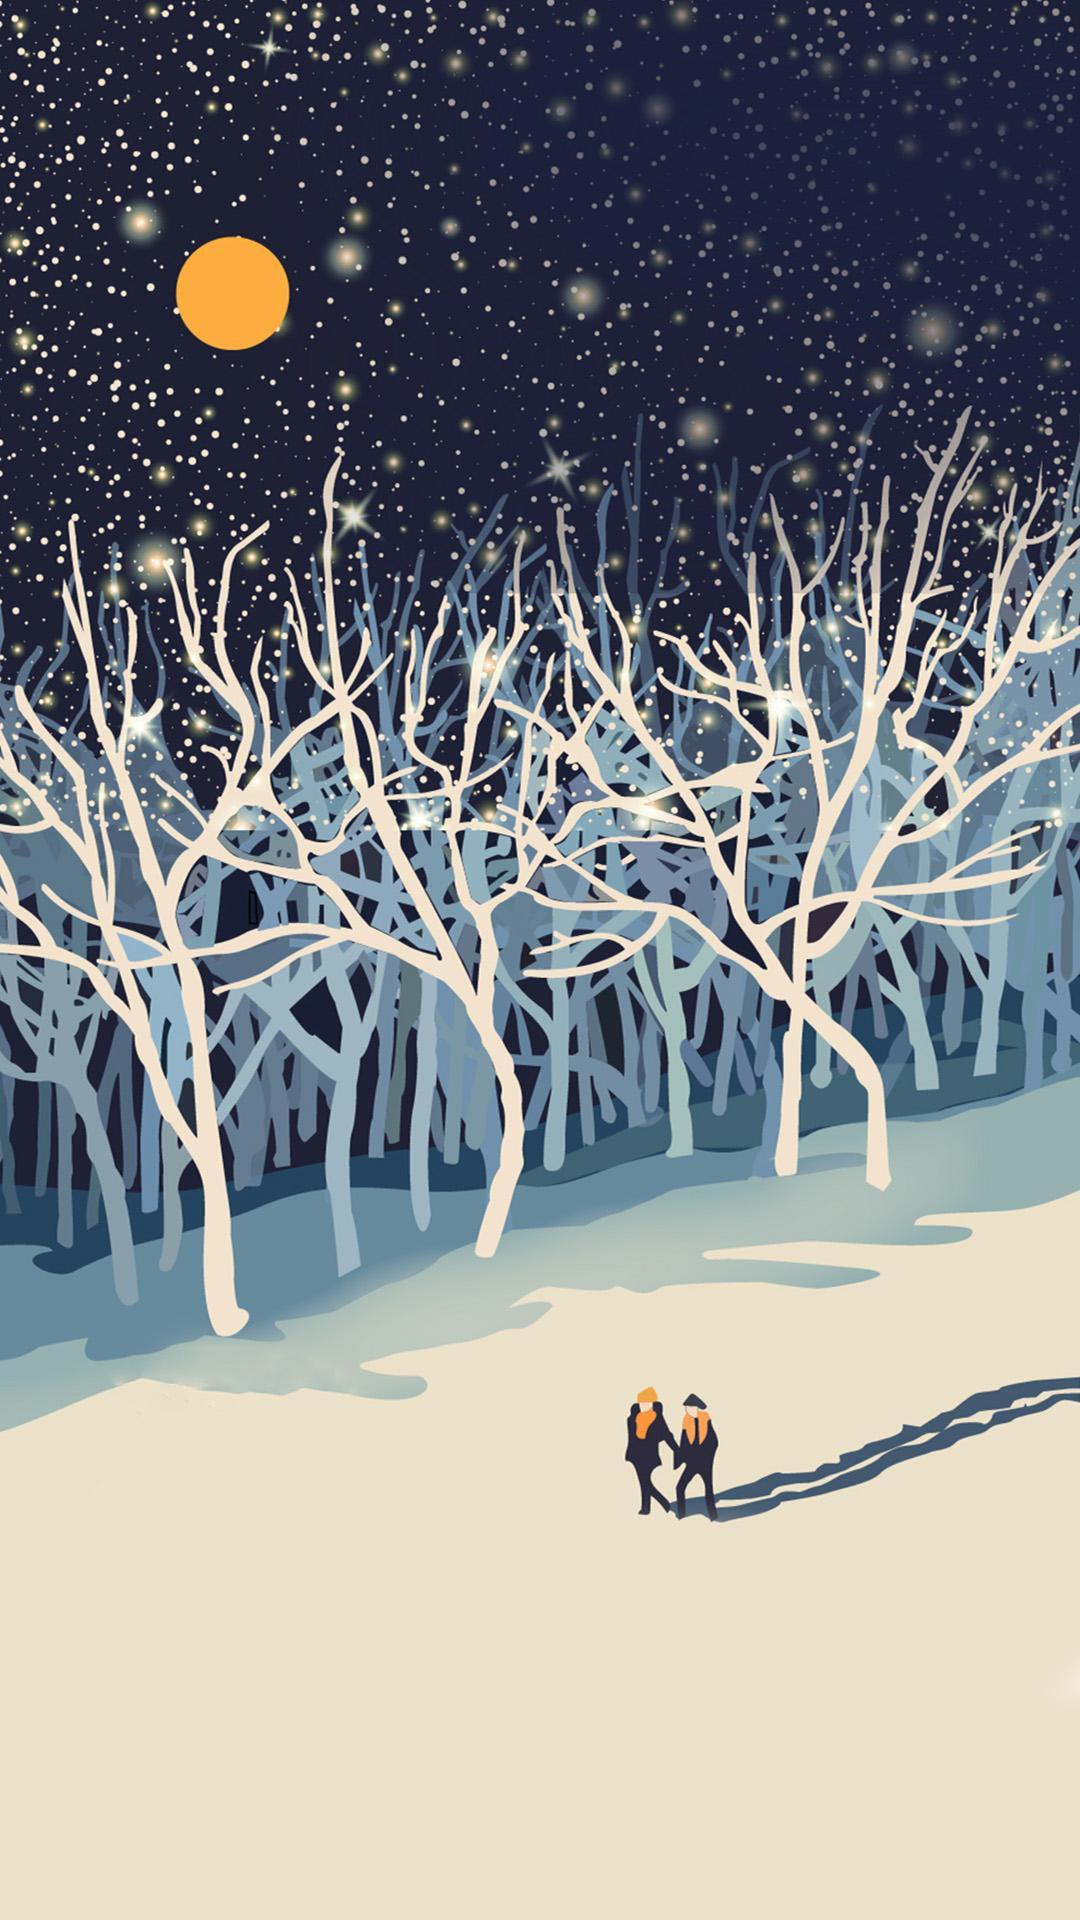 iPhone wallpaper illustration3 Illustration